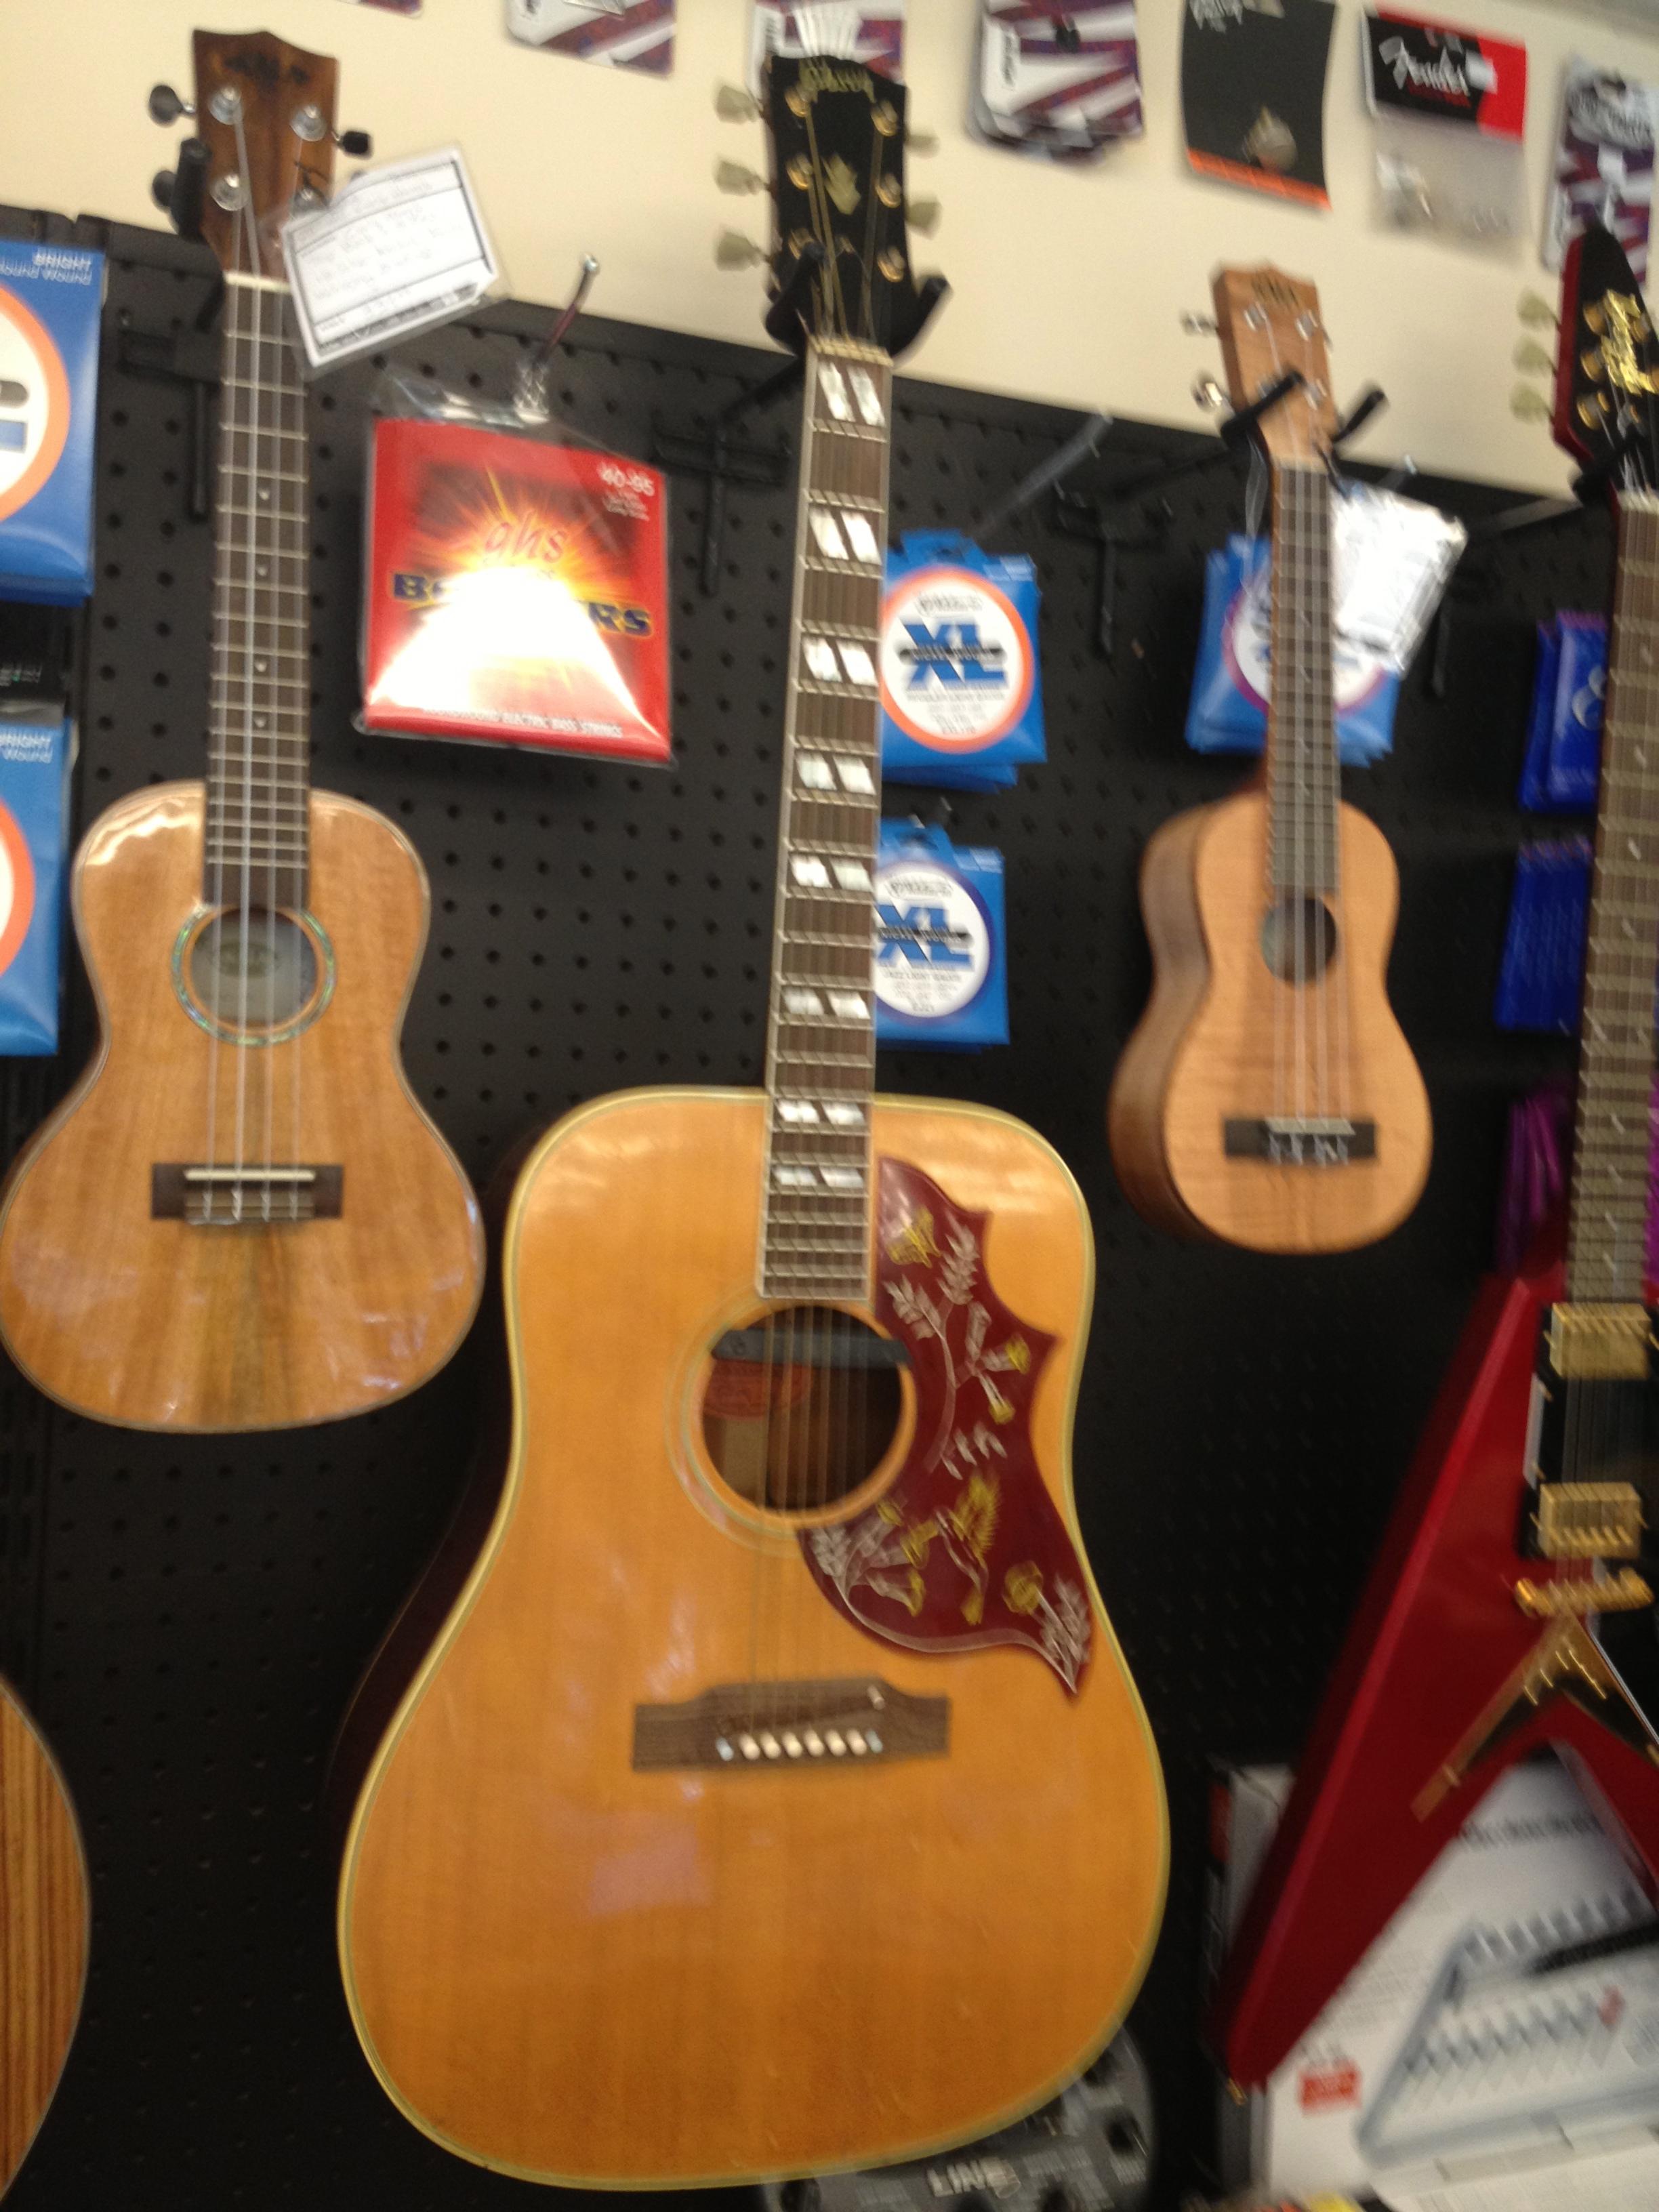 1967 Gibson Hummingbird acoustic guitar